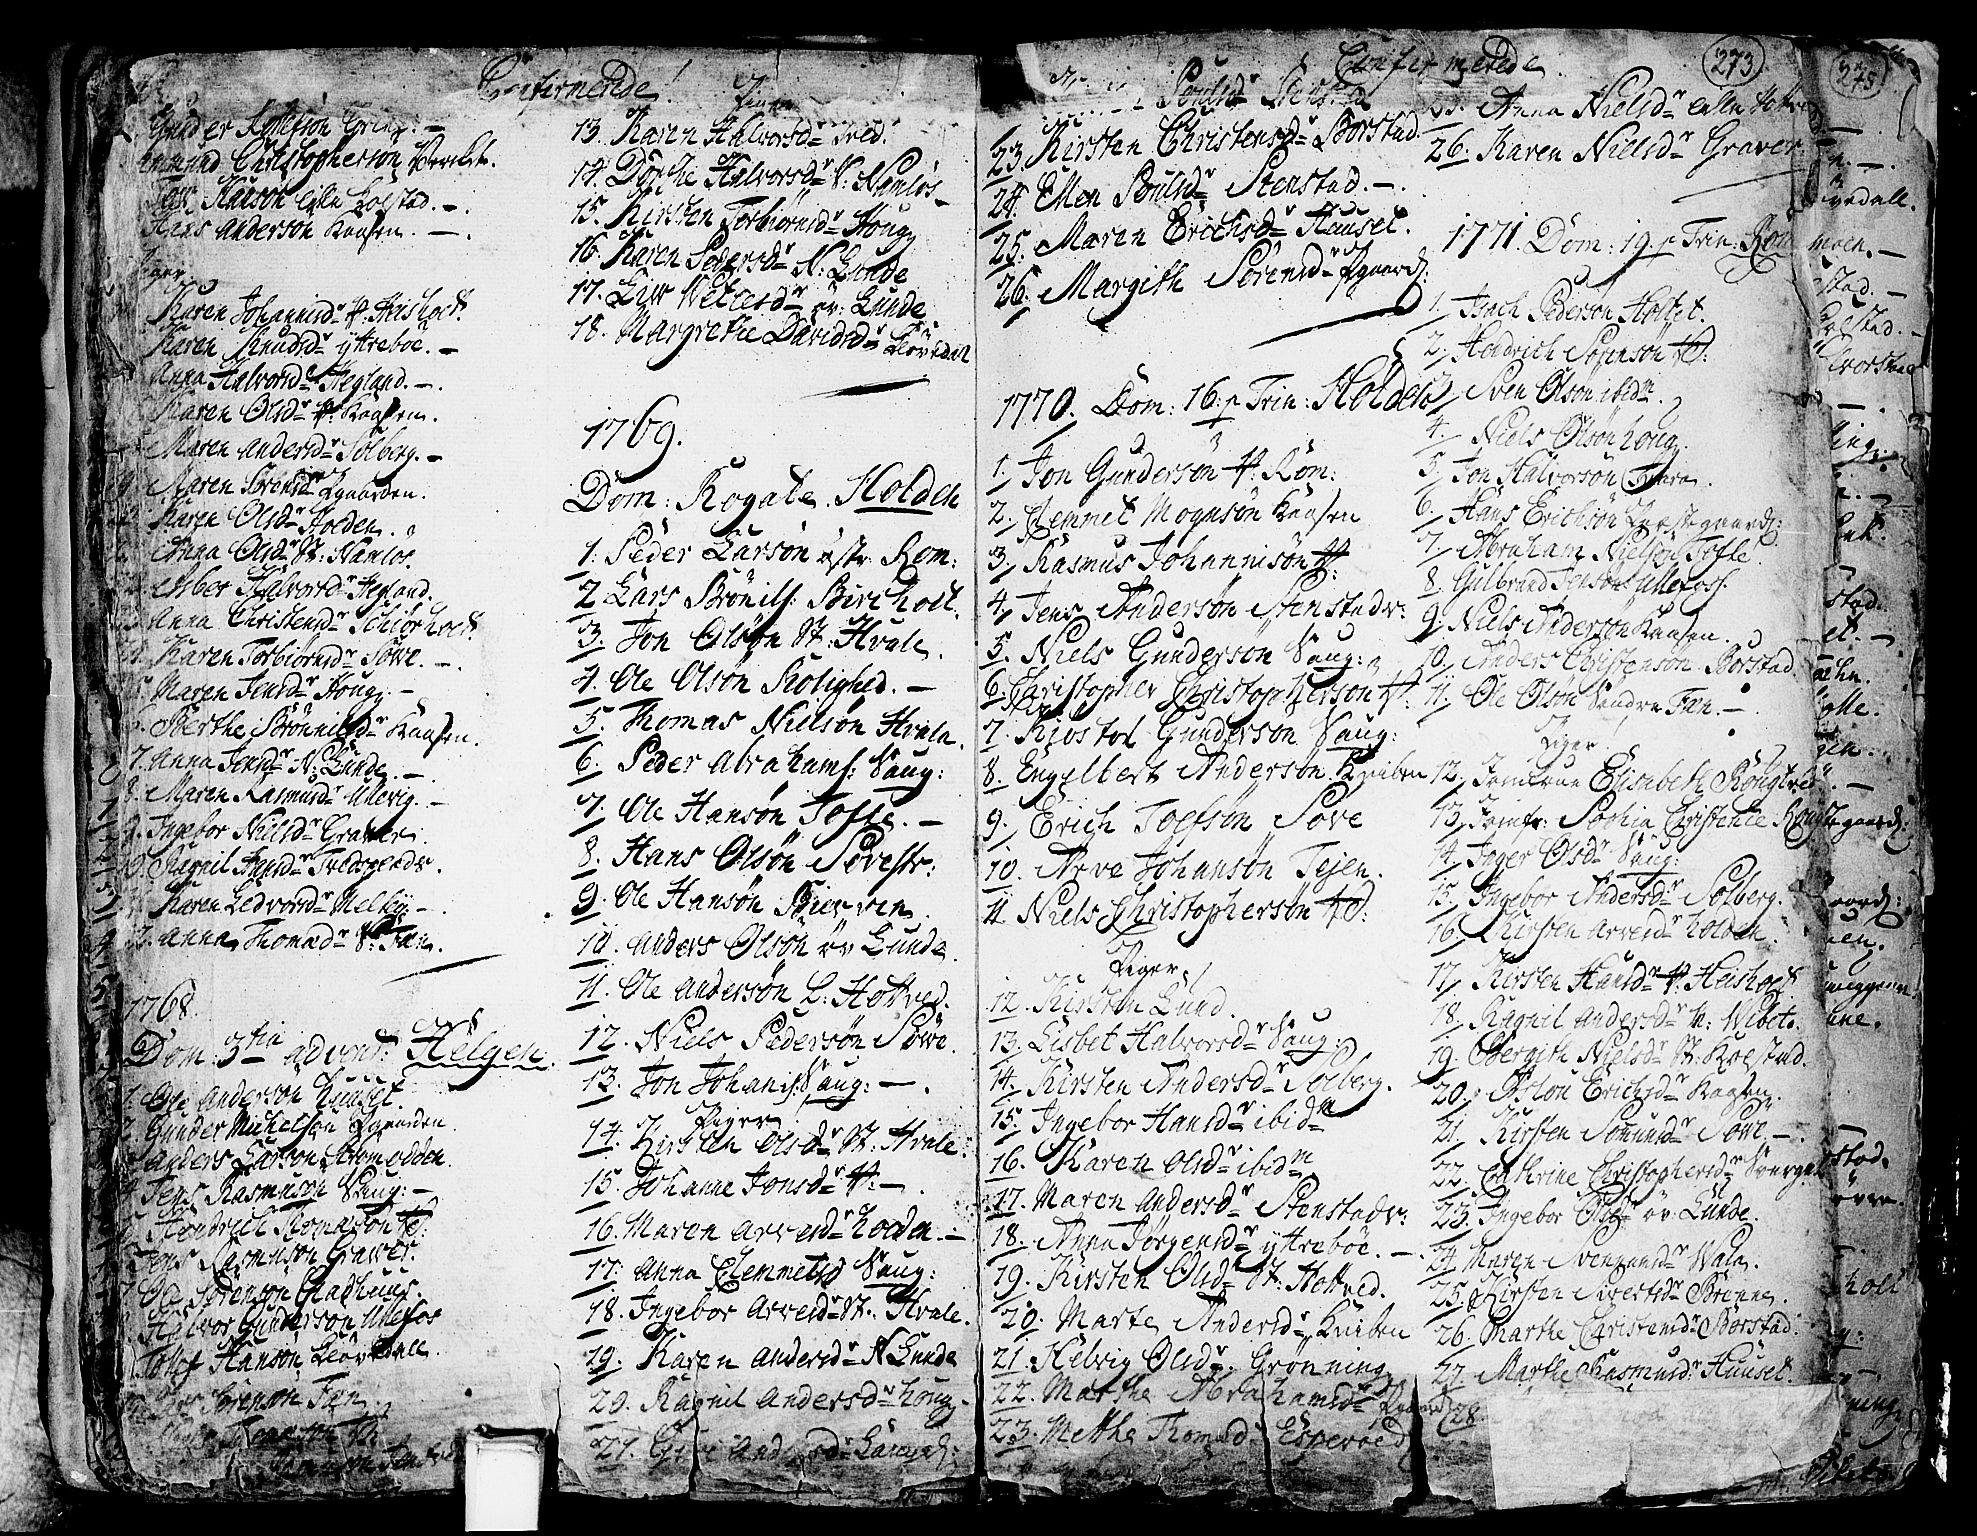 SAKO, Holla kirkebøker, F/Fa/L0001: Ministerialbok nr. 1, 1717-1779, s. 273